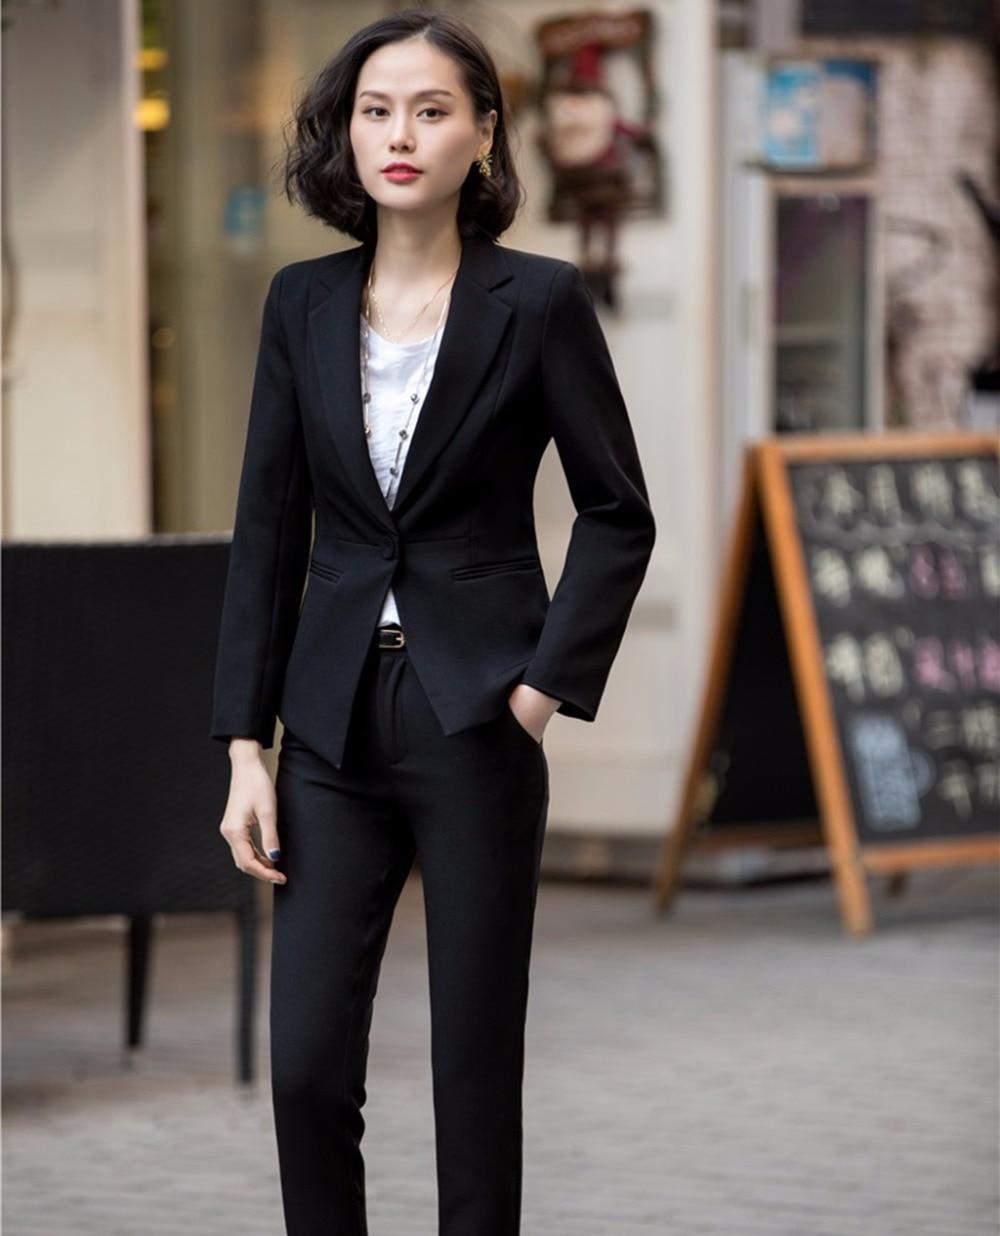 Custom Royal Blue Work Bussiness Formal Elegant Women Suit Set Blazers Pants Office Suits Ladies Pants Suits Trouser Suit Vivid And Great In Style Pant Suits Suits & Sets